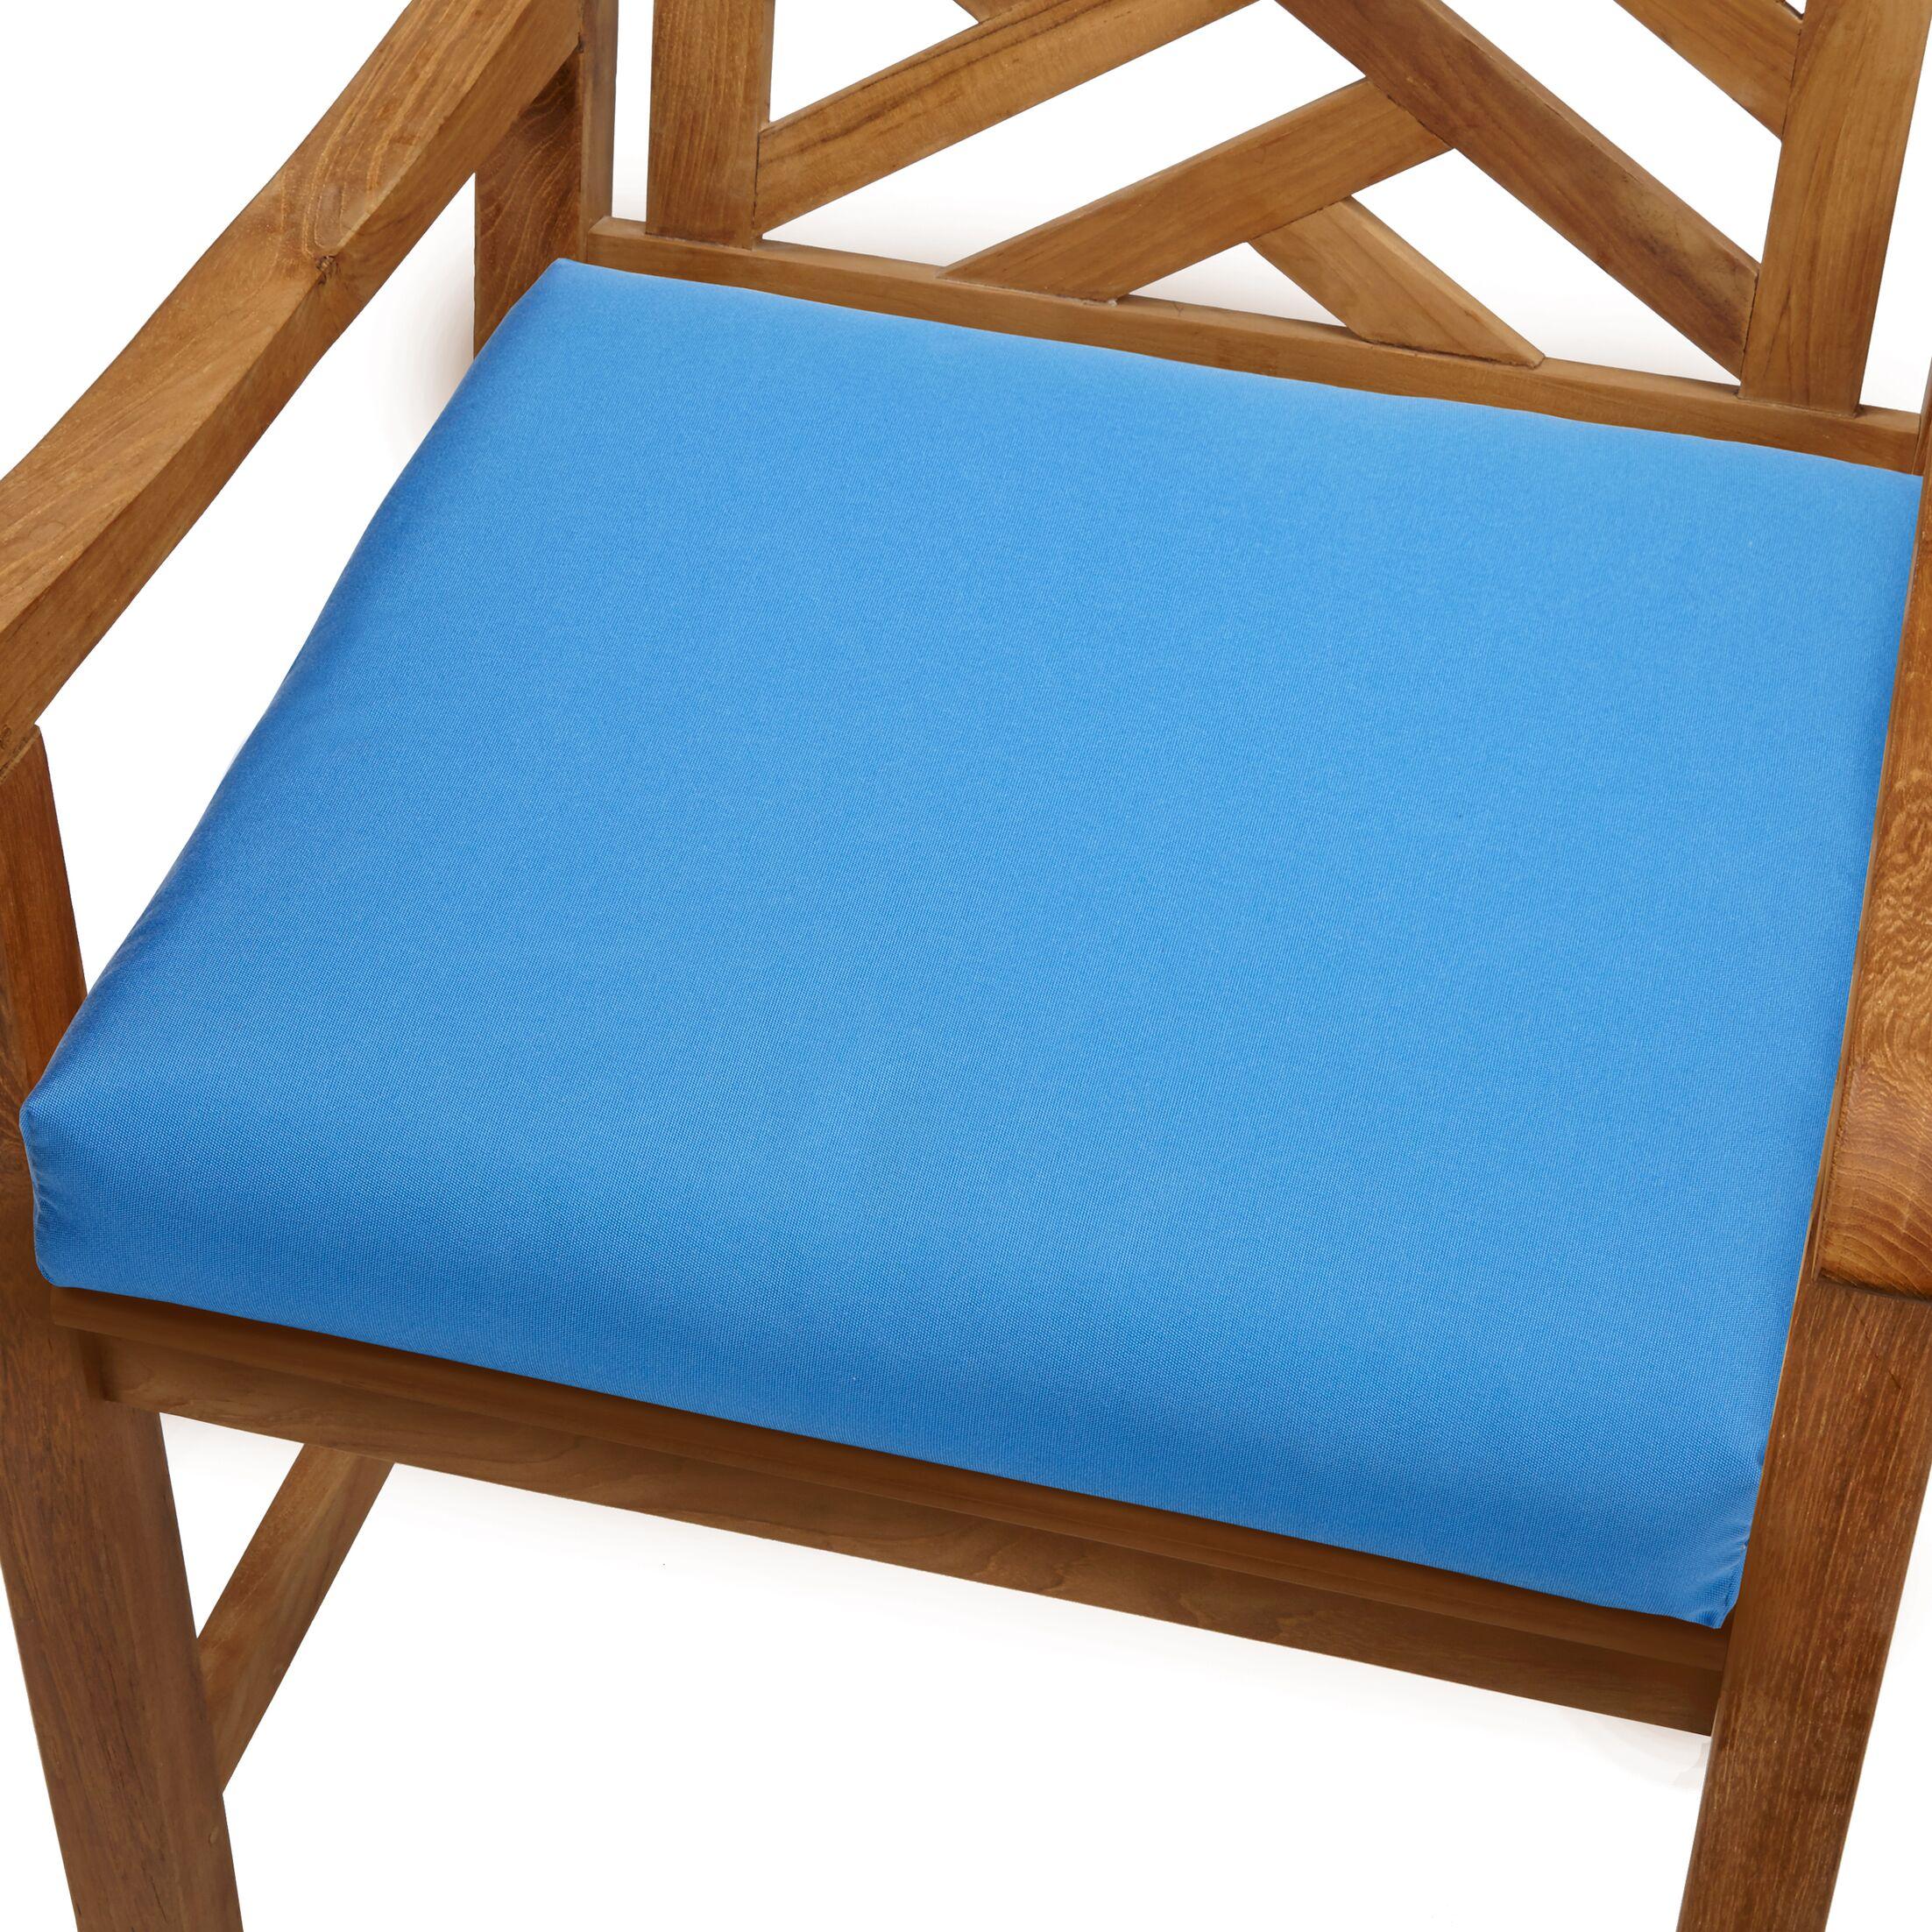 Mcclain Indoor/Outdoor Sunbrella Dining Chair Cushion Fabric: Capri Blue, Size: 20